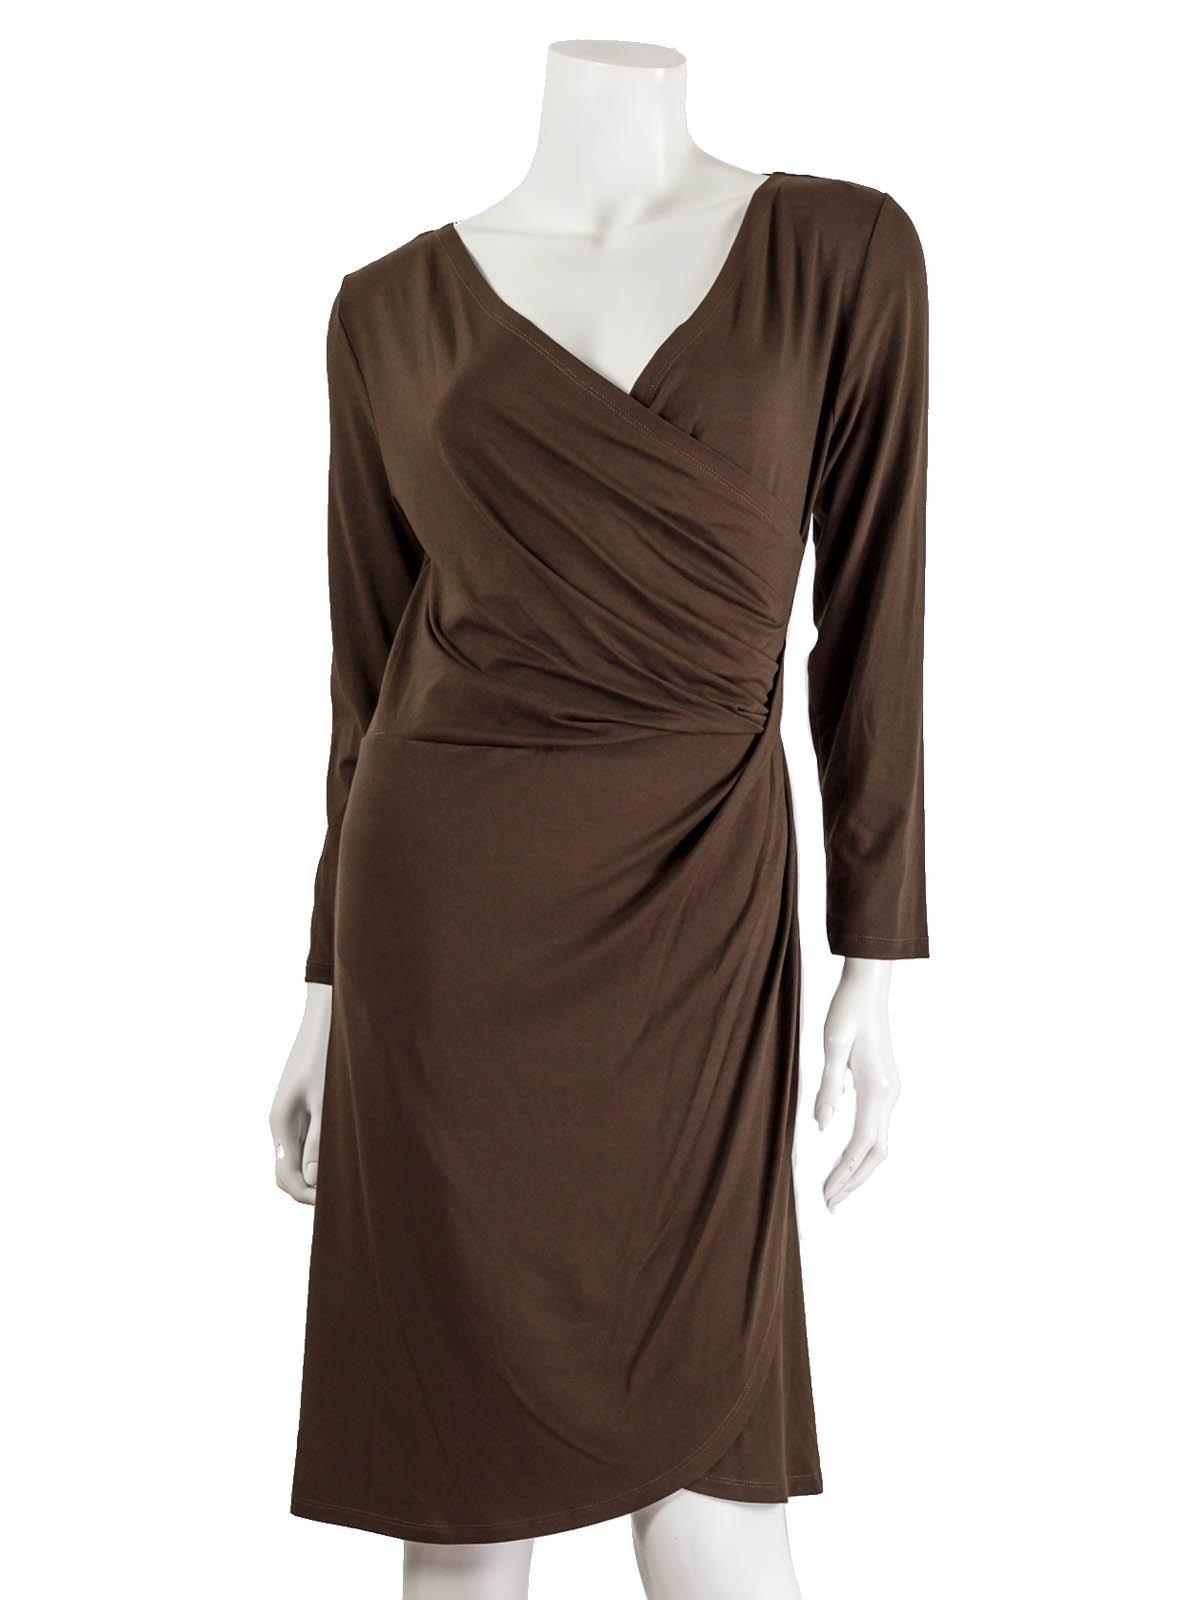 13 Kreativ Kleid Braun ÄrmelAbend Genial Kleid Braun Spezialgebiet